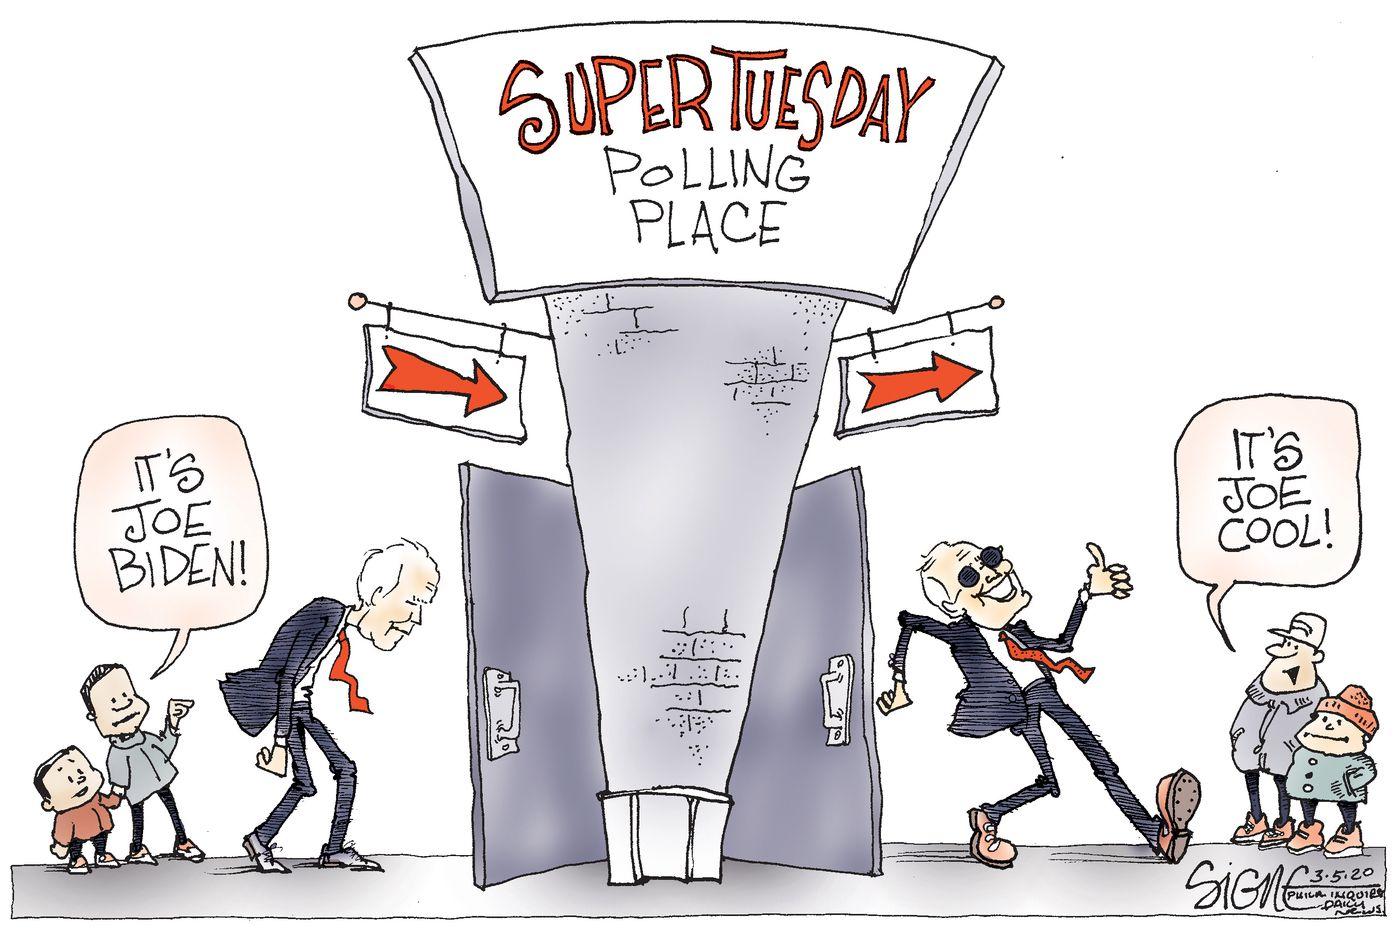 Political Cartoon: Good Ol' Joe Biden's Super Tuesday transformation